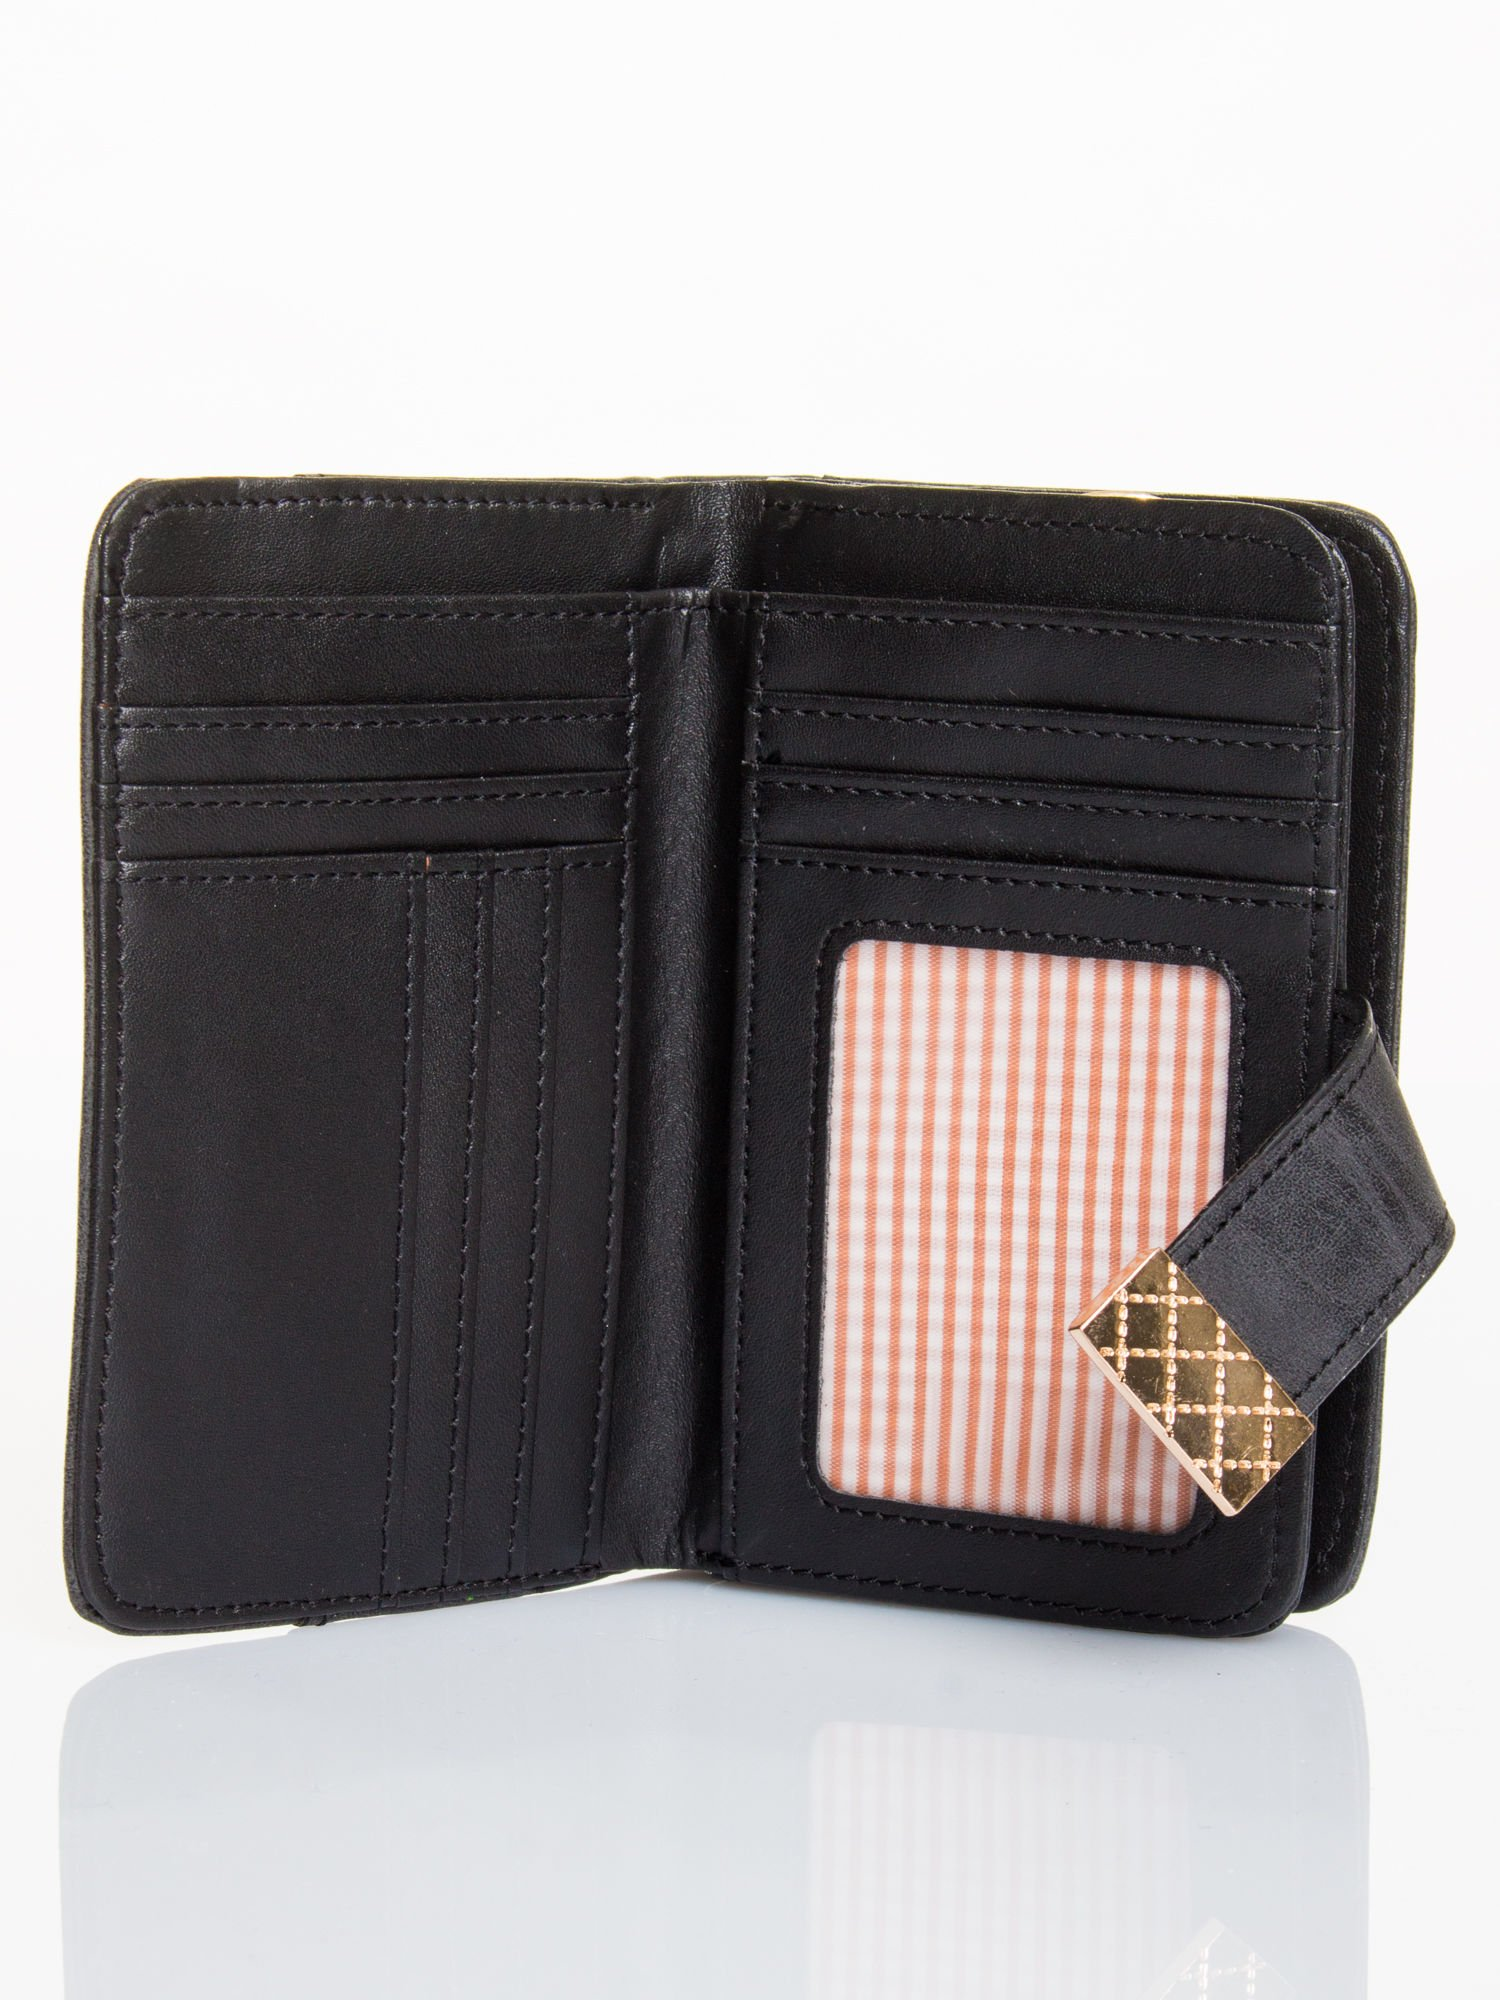 Czarny portfel z plecionką                                  zdj.                                  3